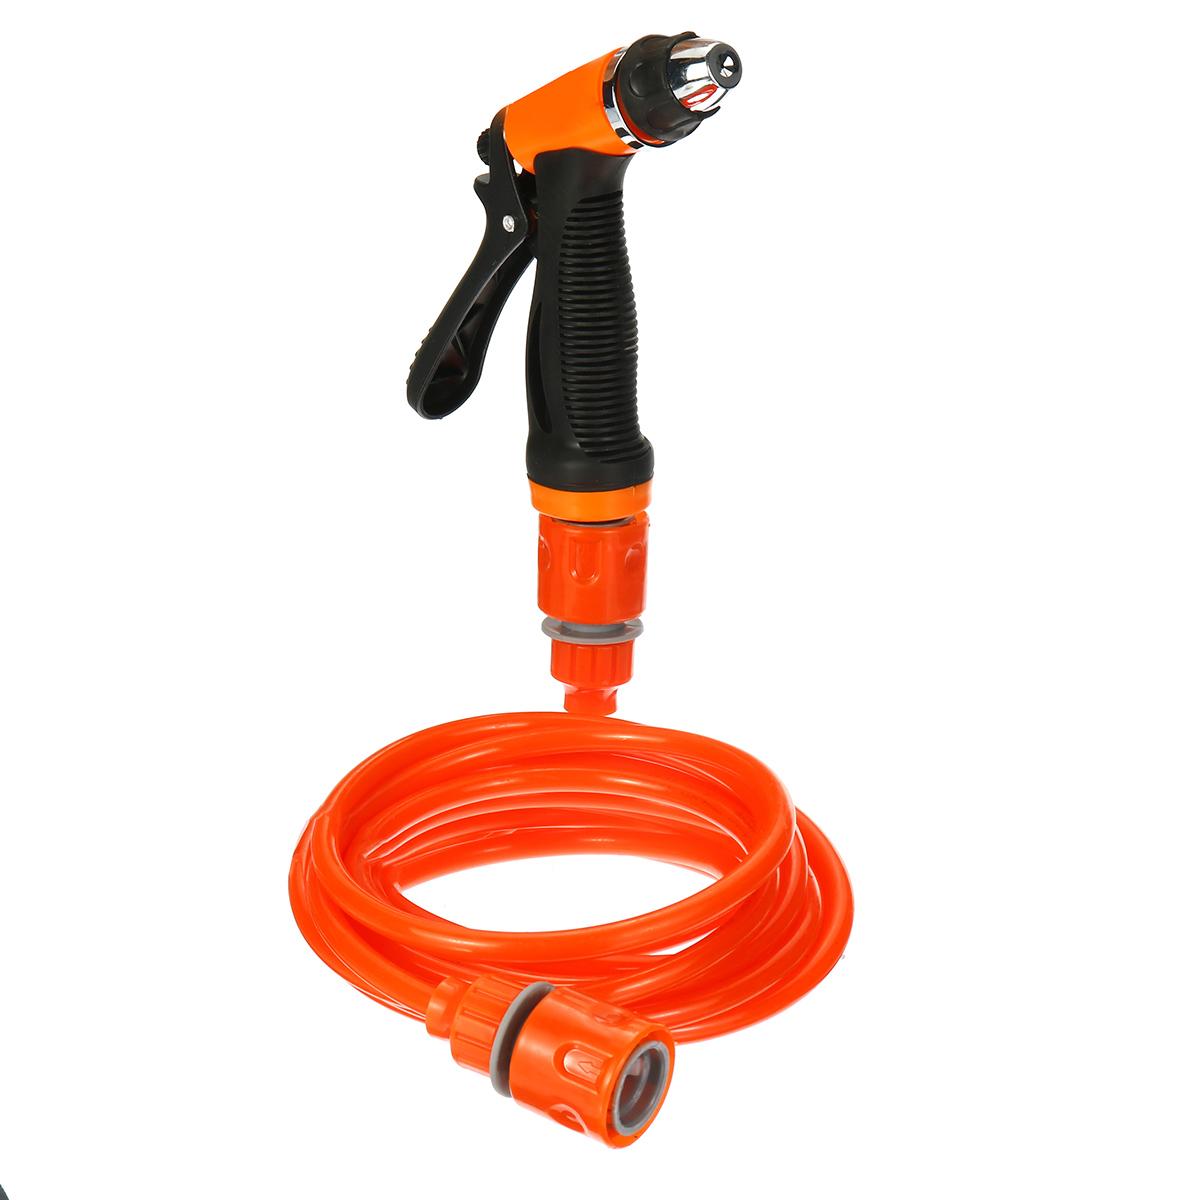 100W 5.5L High Pressure Self-Priming Electric Car Wash Pump Power Tool 12v Portable Washing Machine Water Pump Set